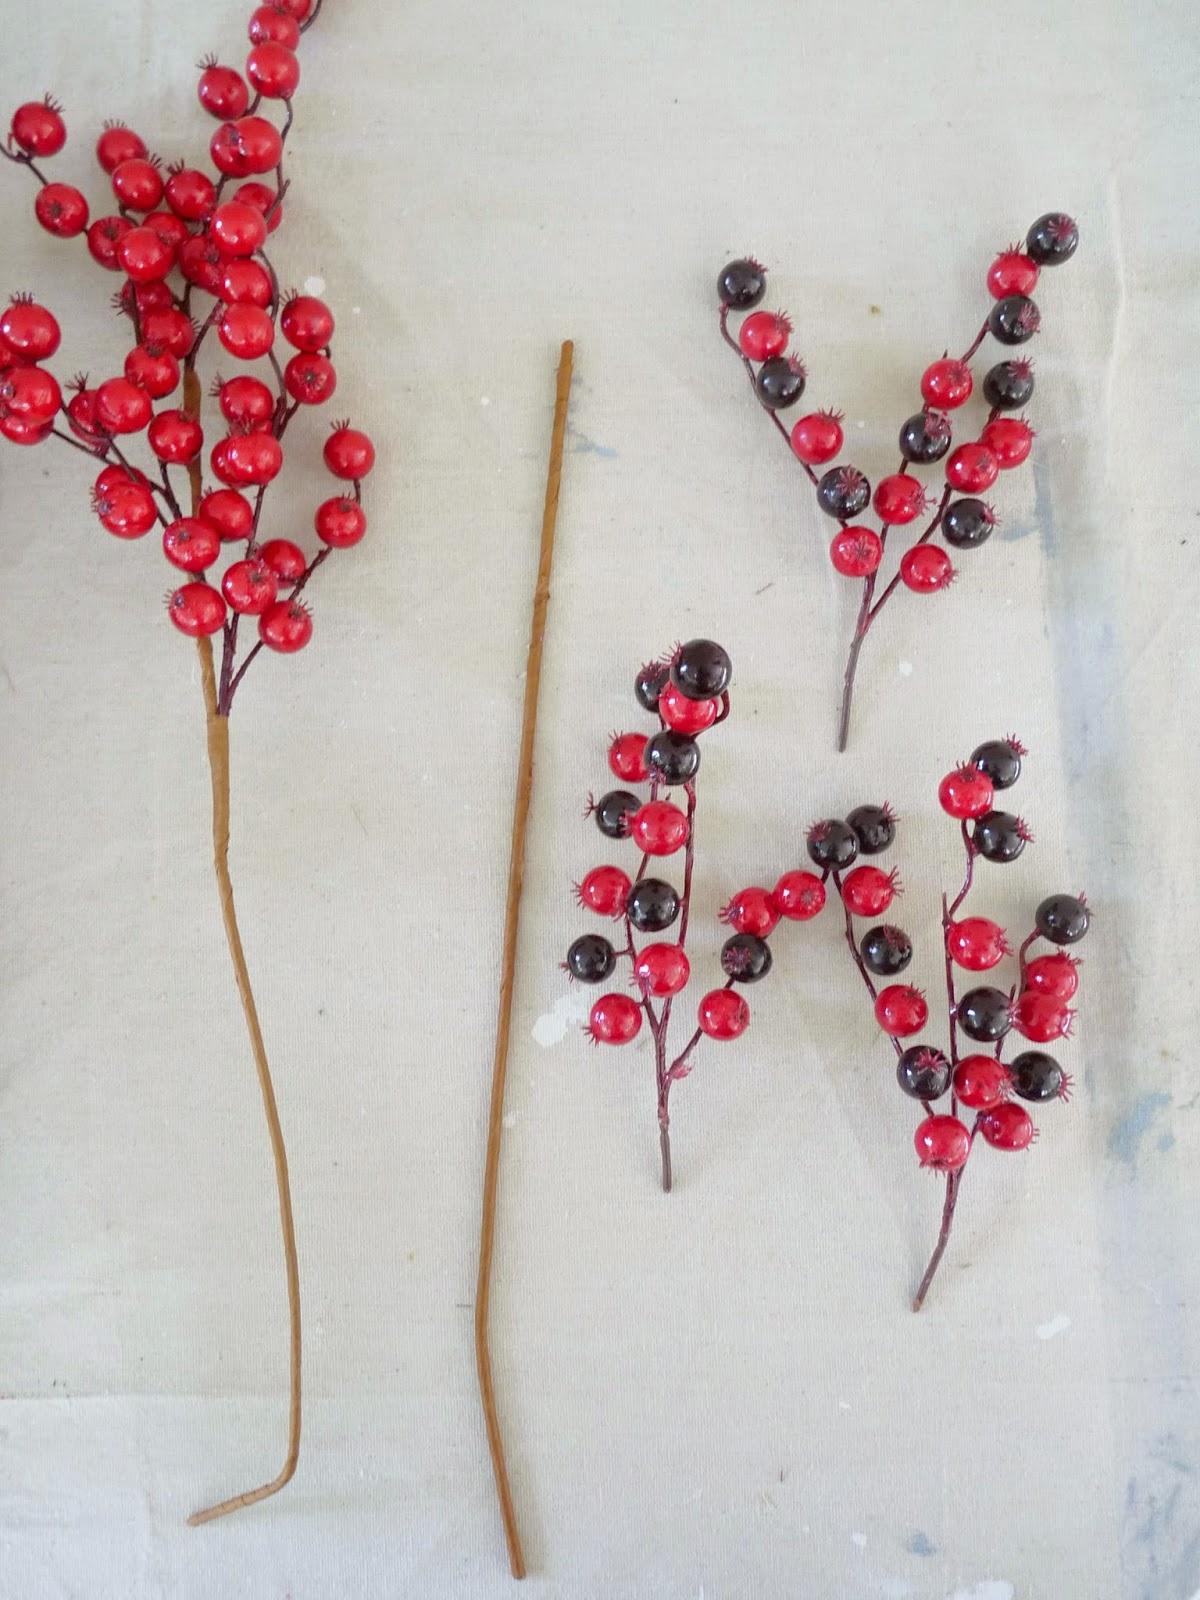 Cranberry holiday decor